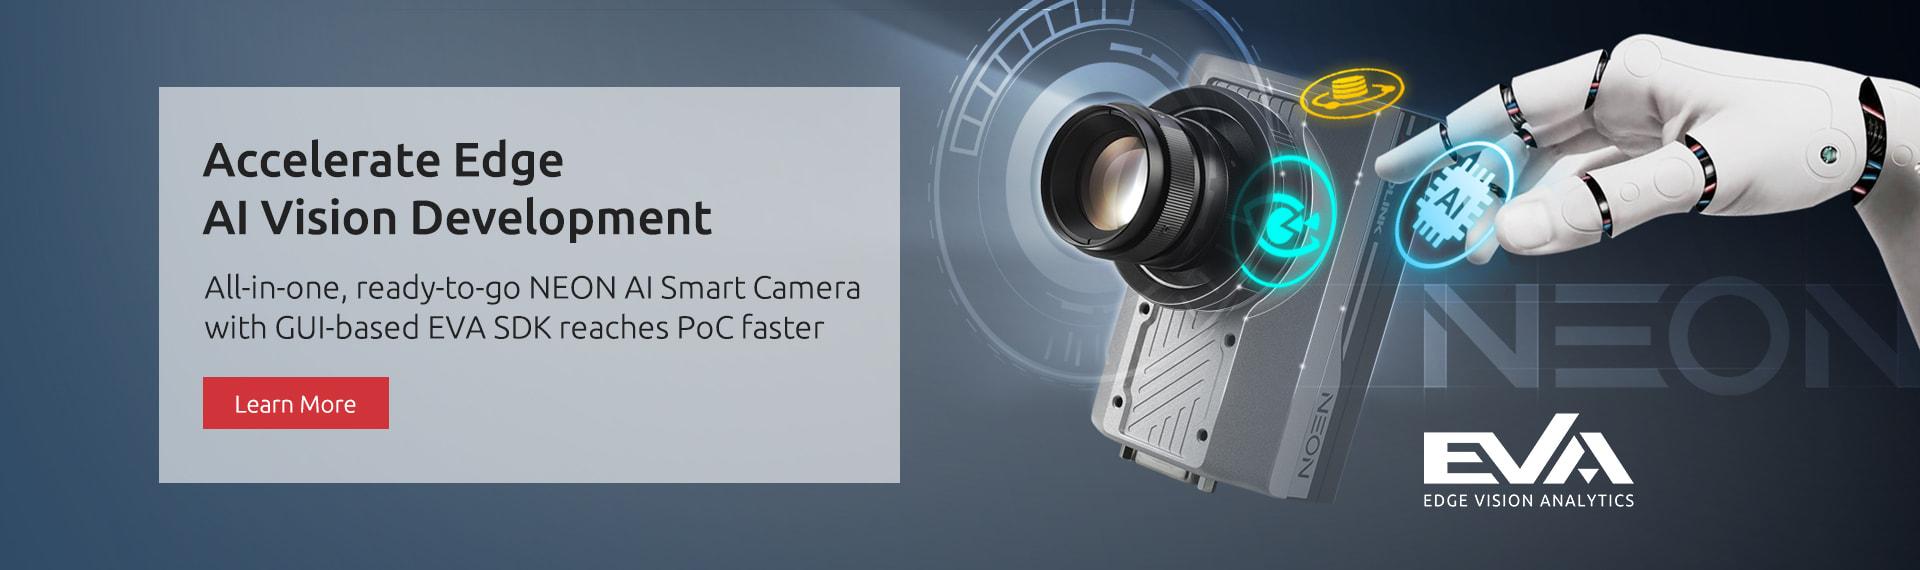 AI Vision Case Smart Camera Robot Hazard Prevention